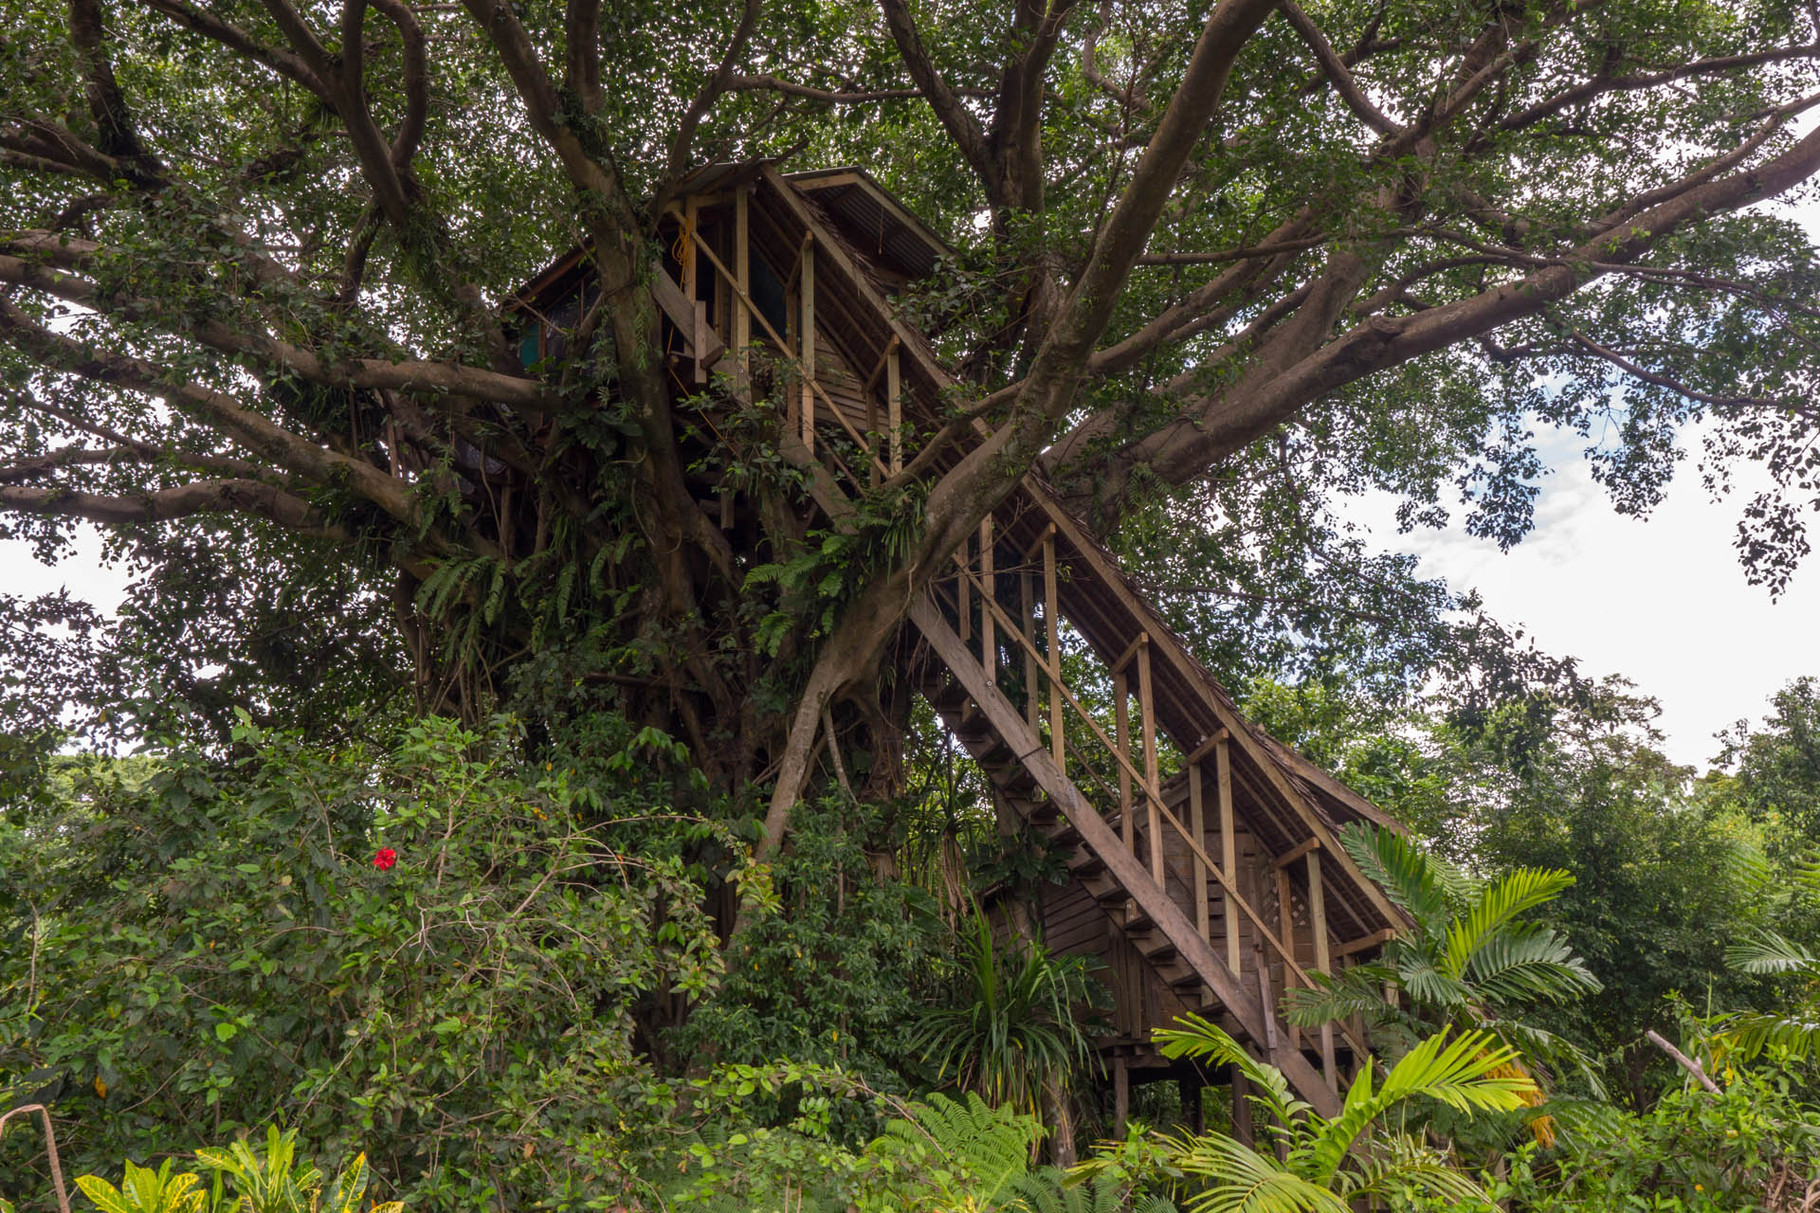 Treehouse bungalows near Yasur volcano, Tanna island